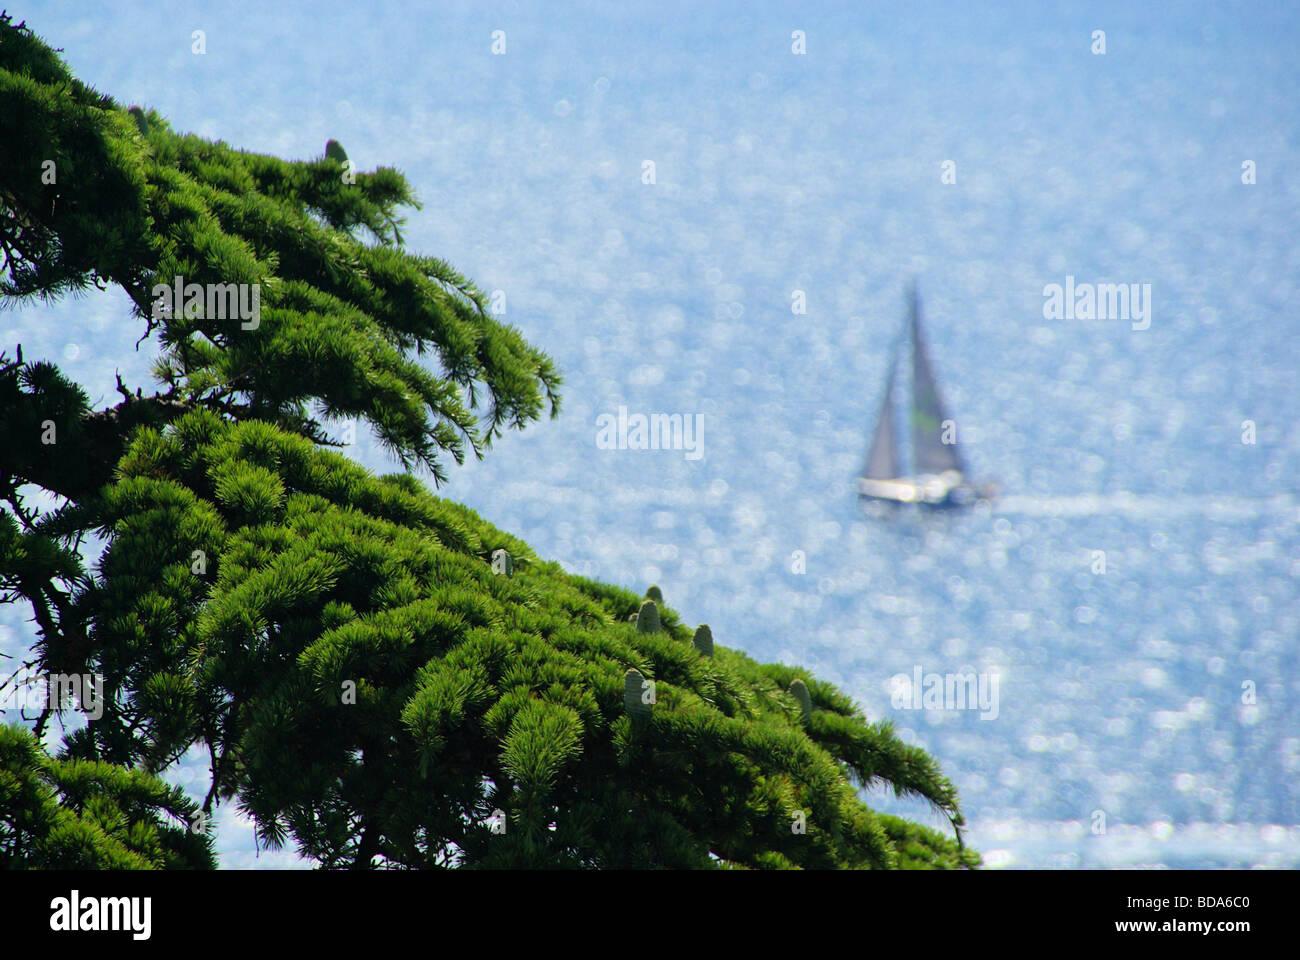 Segelboot mit Zeder cedar with sailing boat 01 - Stock Image